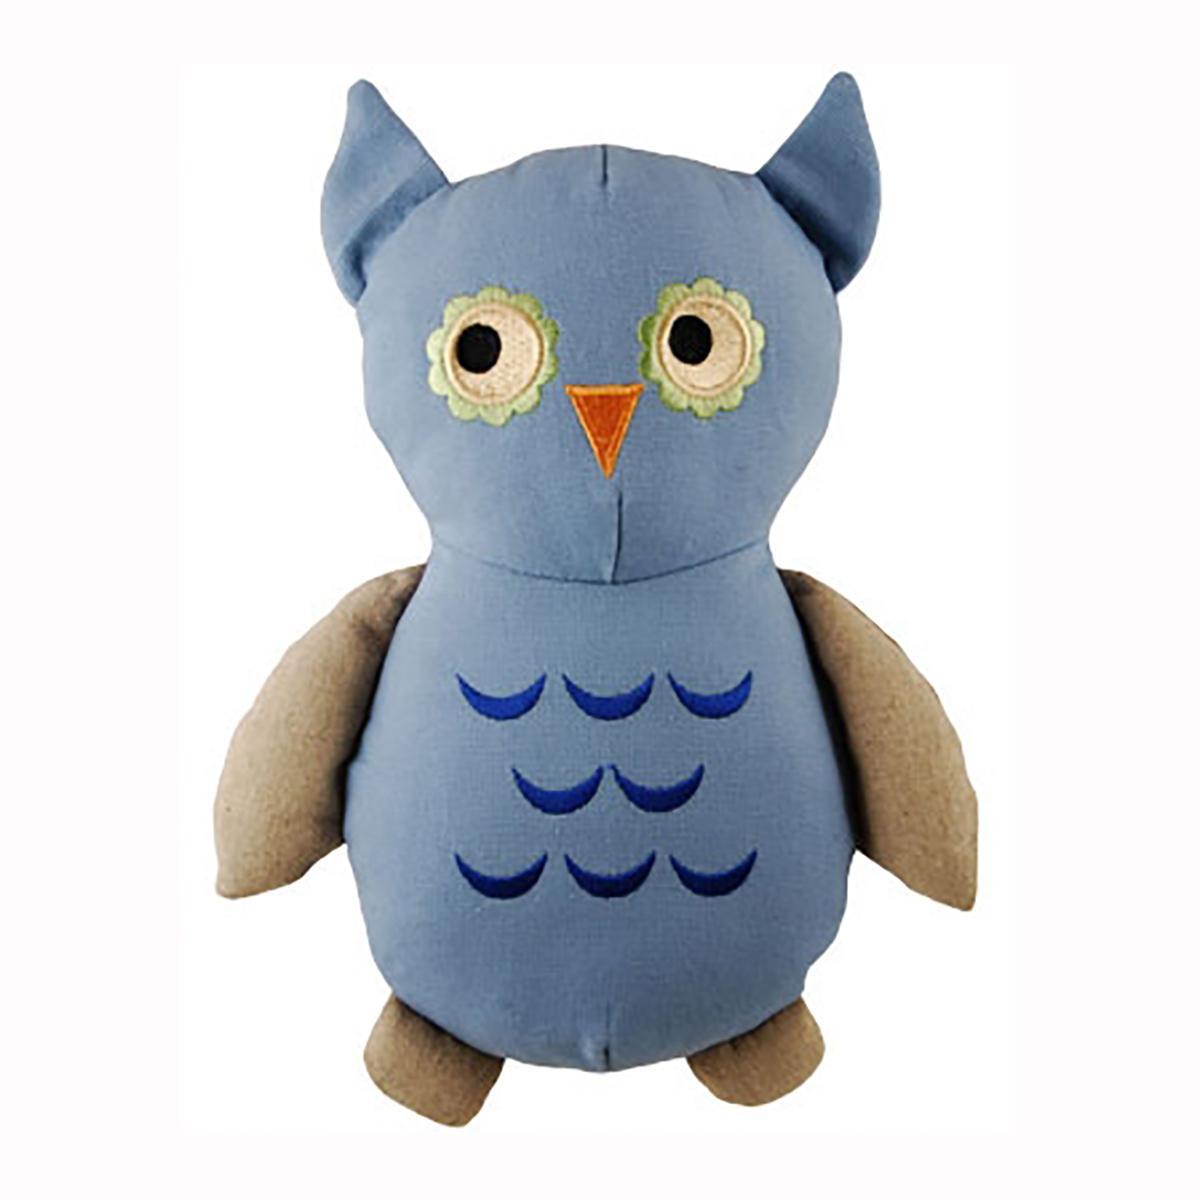 Simply Fido Owl Dog Toy - Basic Big Joe Owl